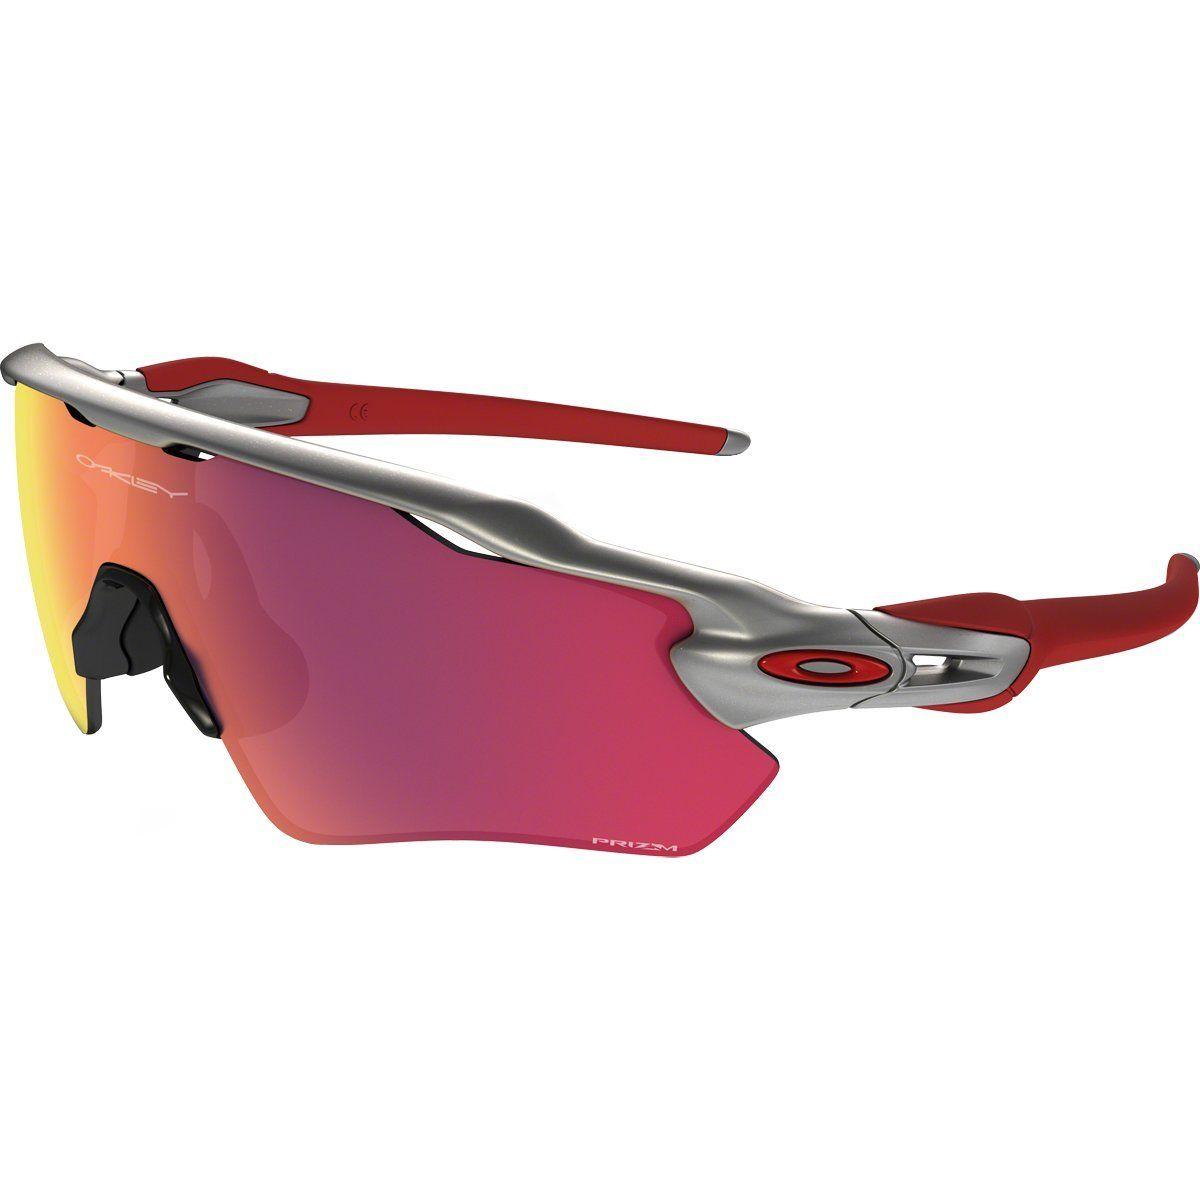 6f333056929 Oakley Mens Radar EV Path MLB Sunglasses